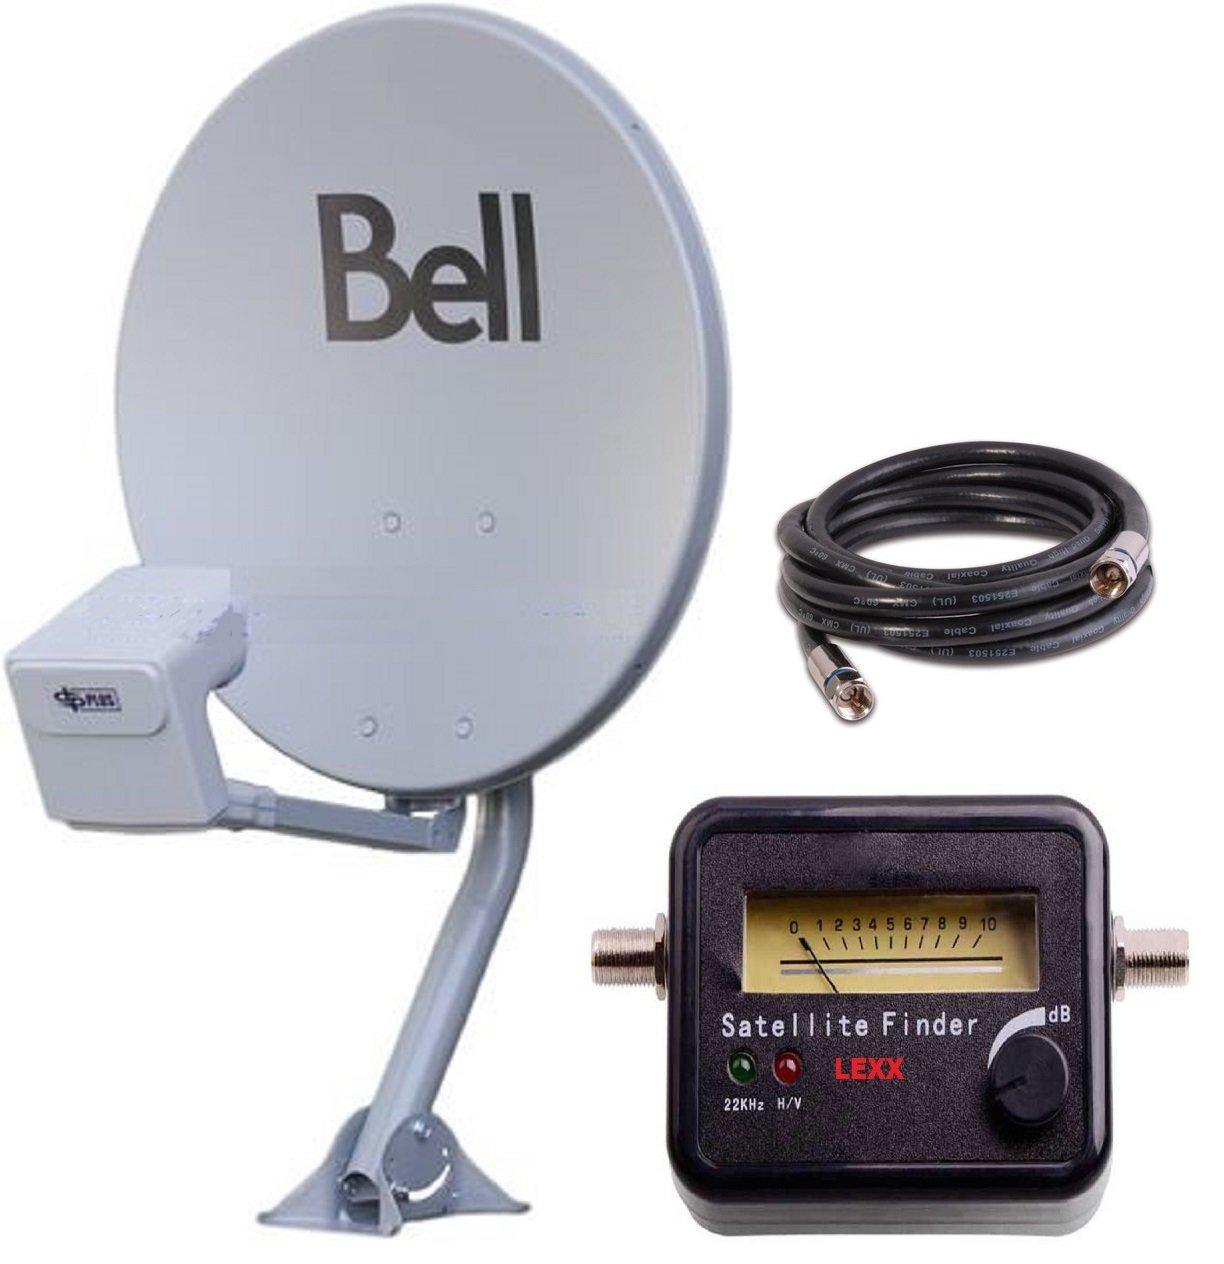 20' BELL TV SATELLITE DISH 500 KIT- Twin DPP LNB With Satellite Finder DISH500